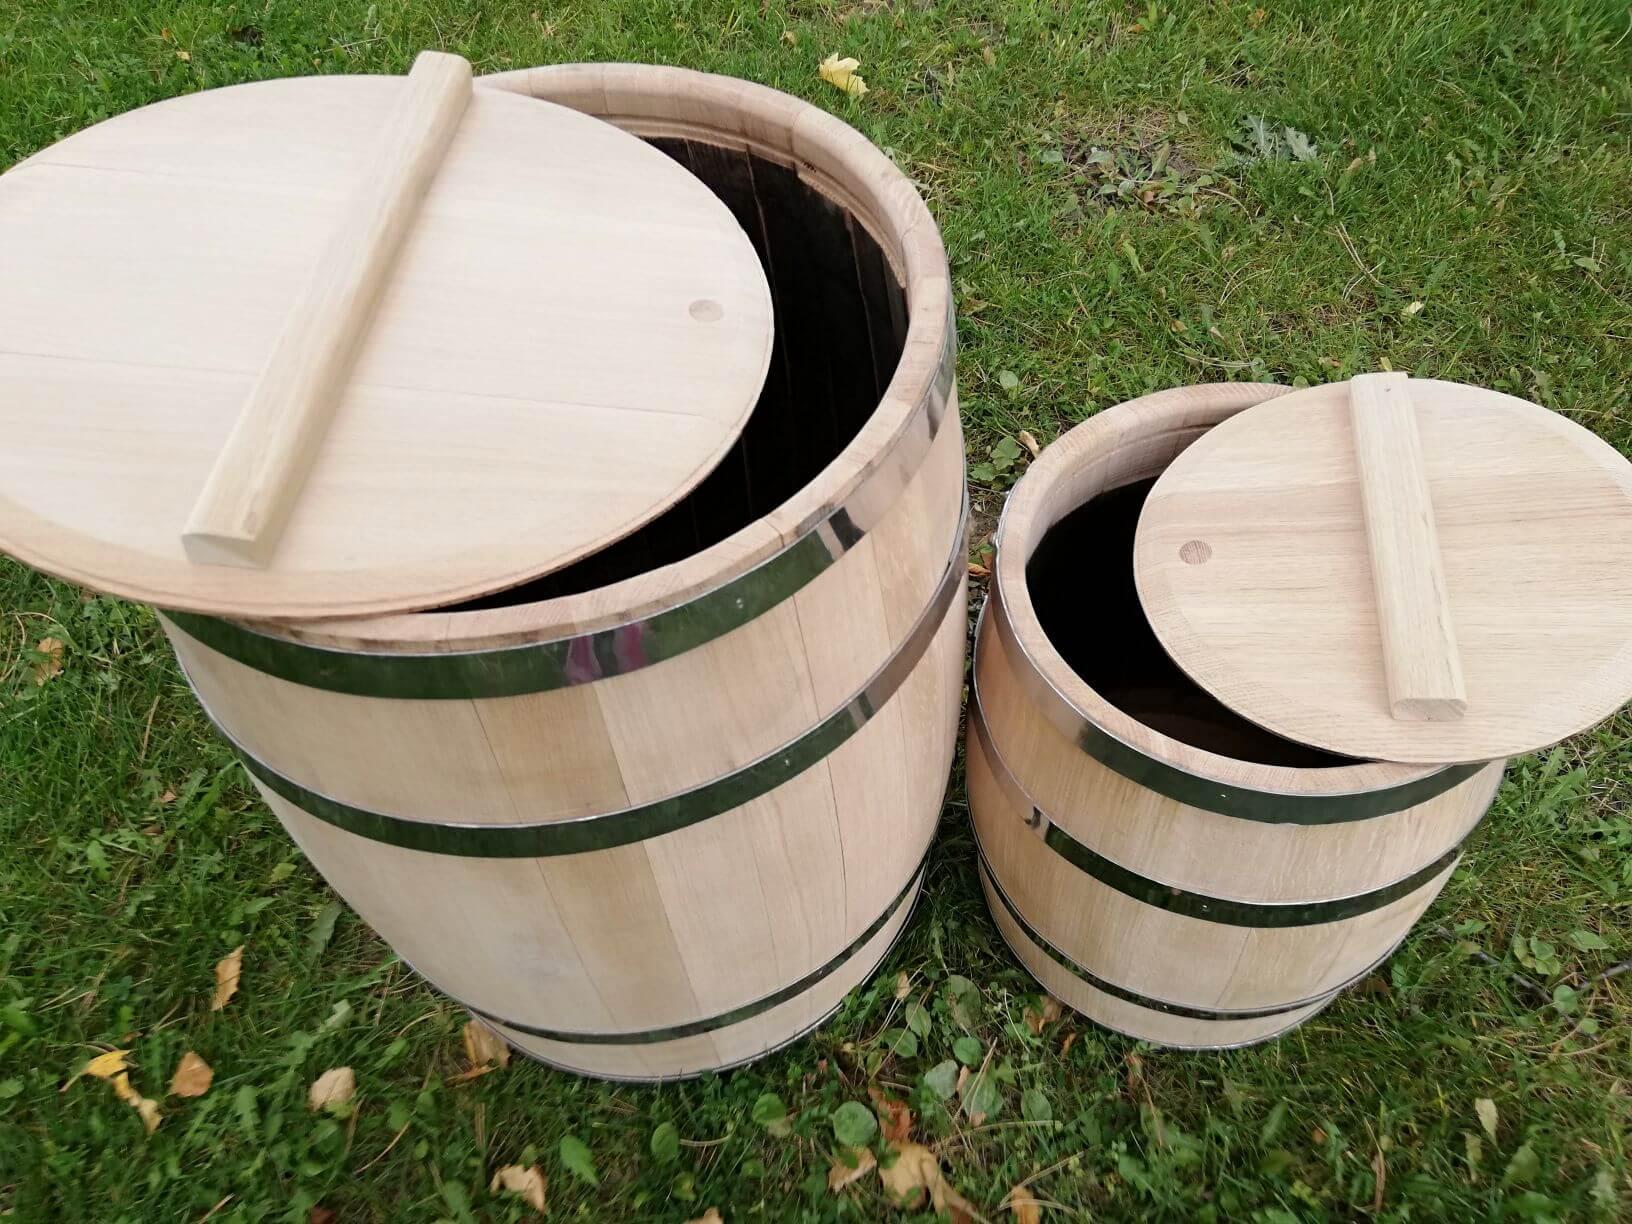 Pickle barrel 23L